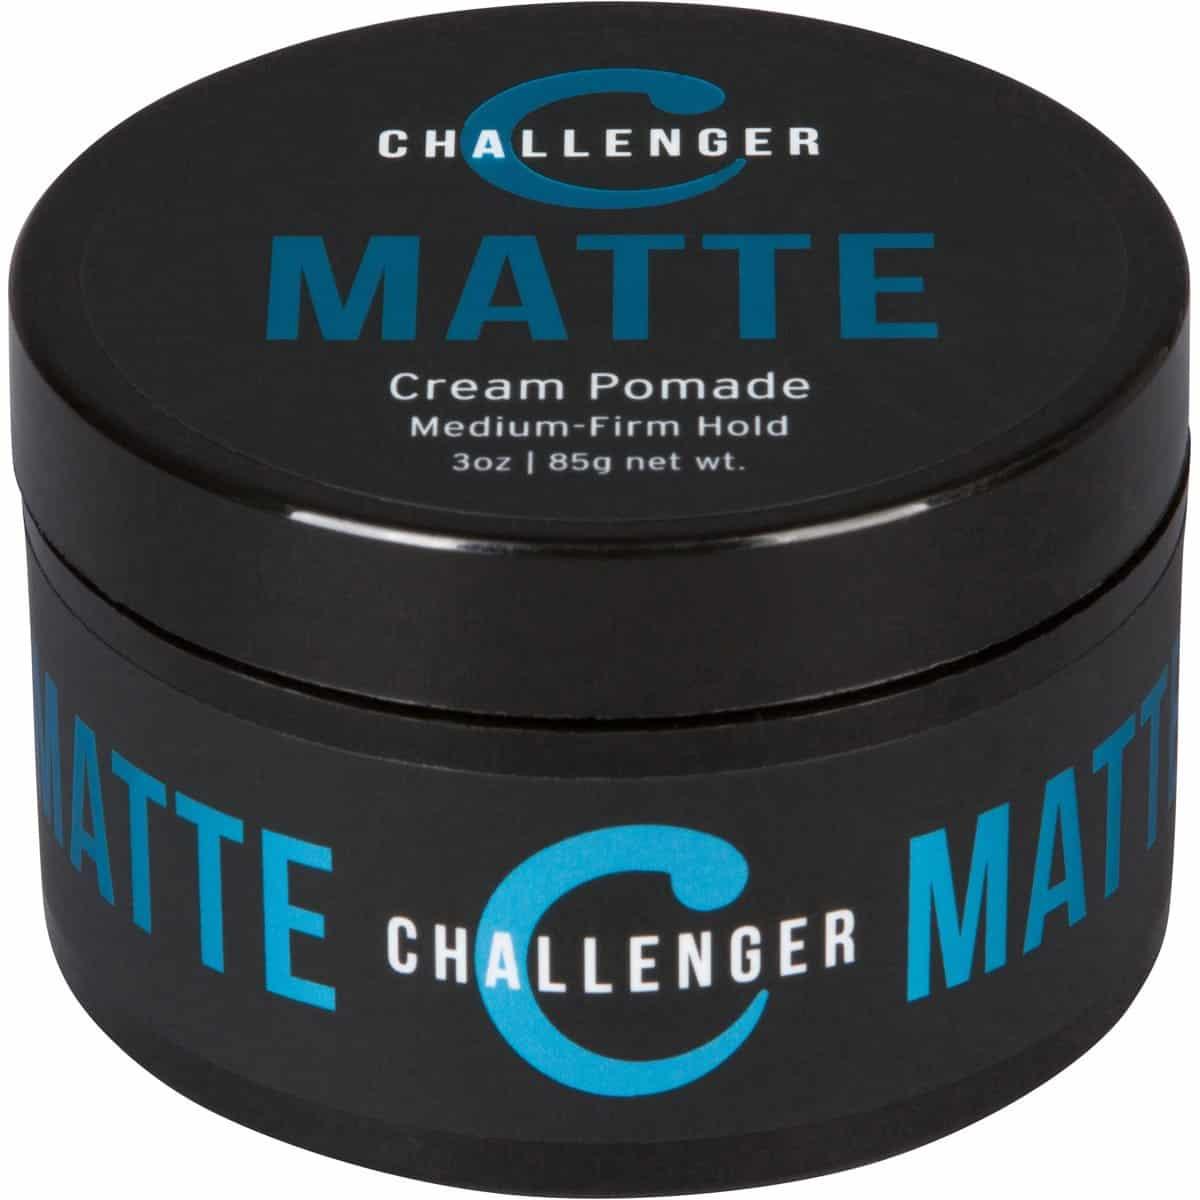 קרם לשיער Challenger